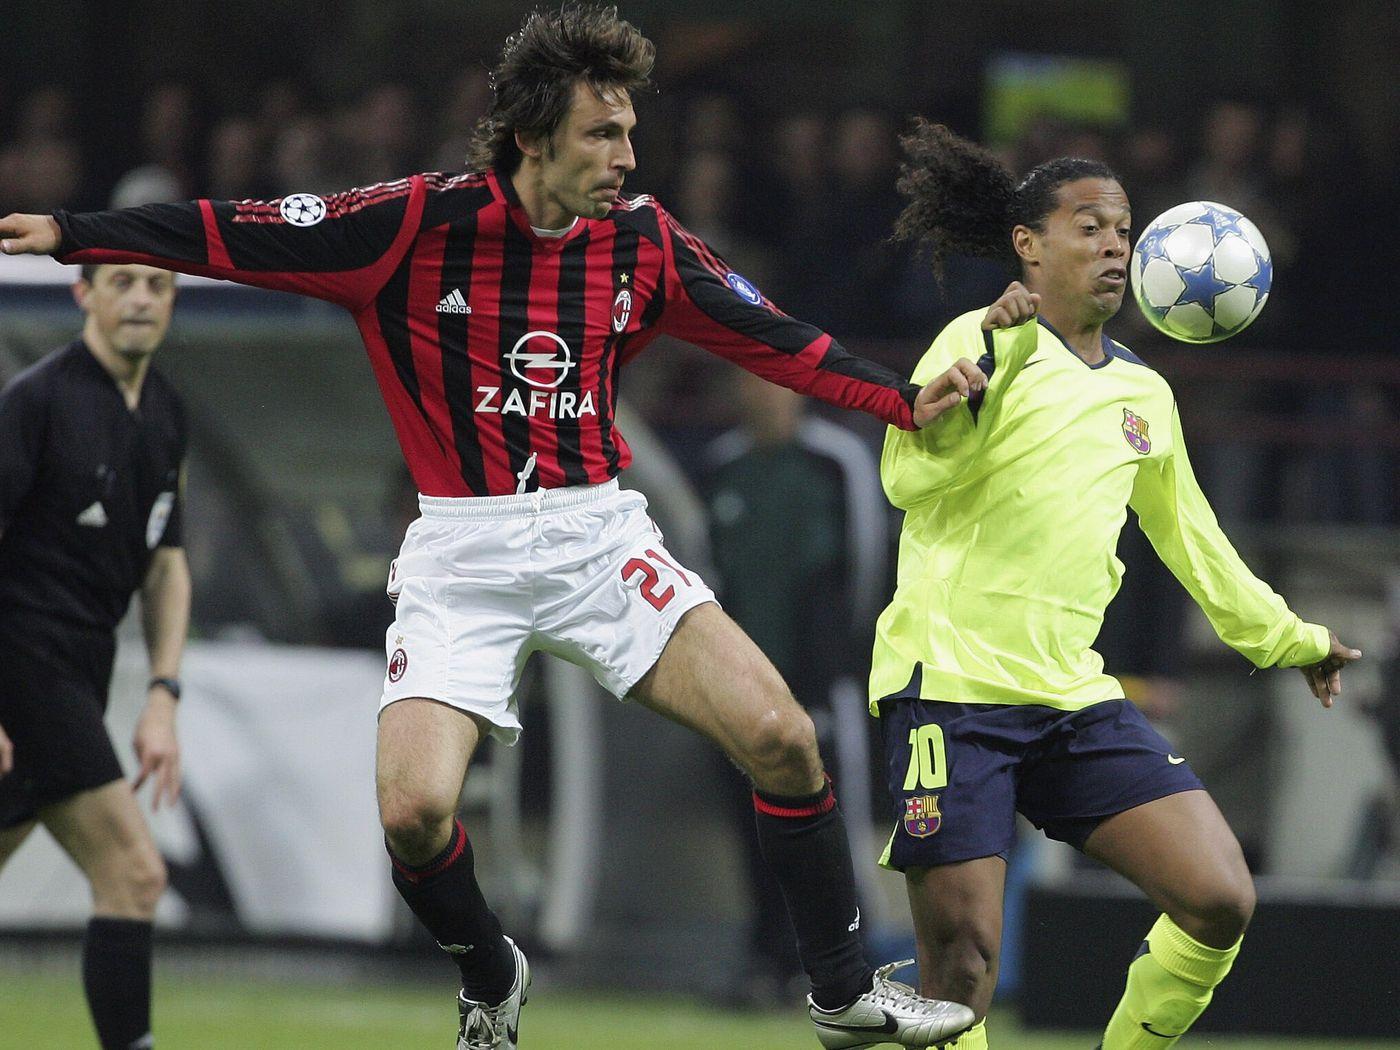 Barcelona Champions League Memories 2006 Cl Semis Vs Ac Milan Barca Blaugranes